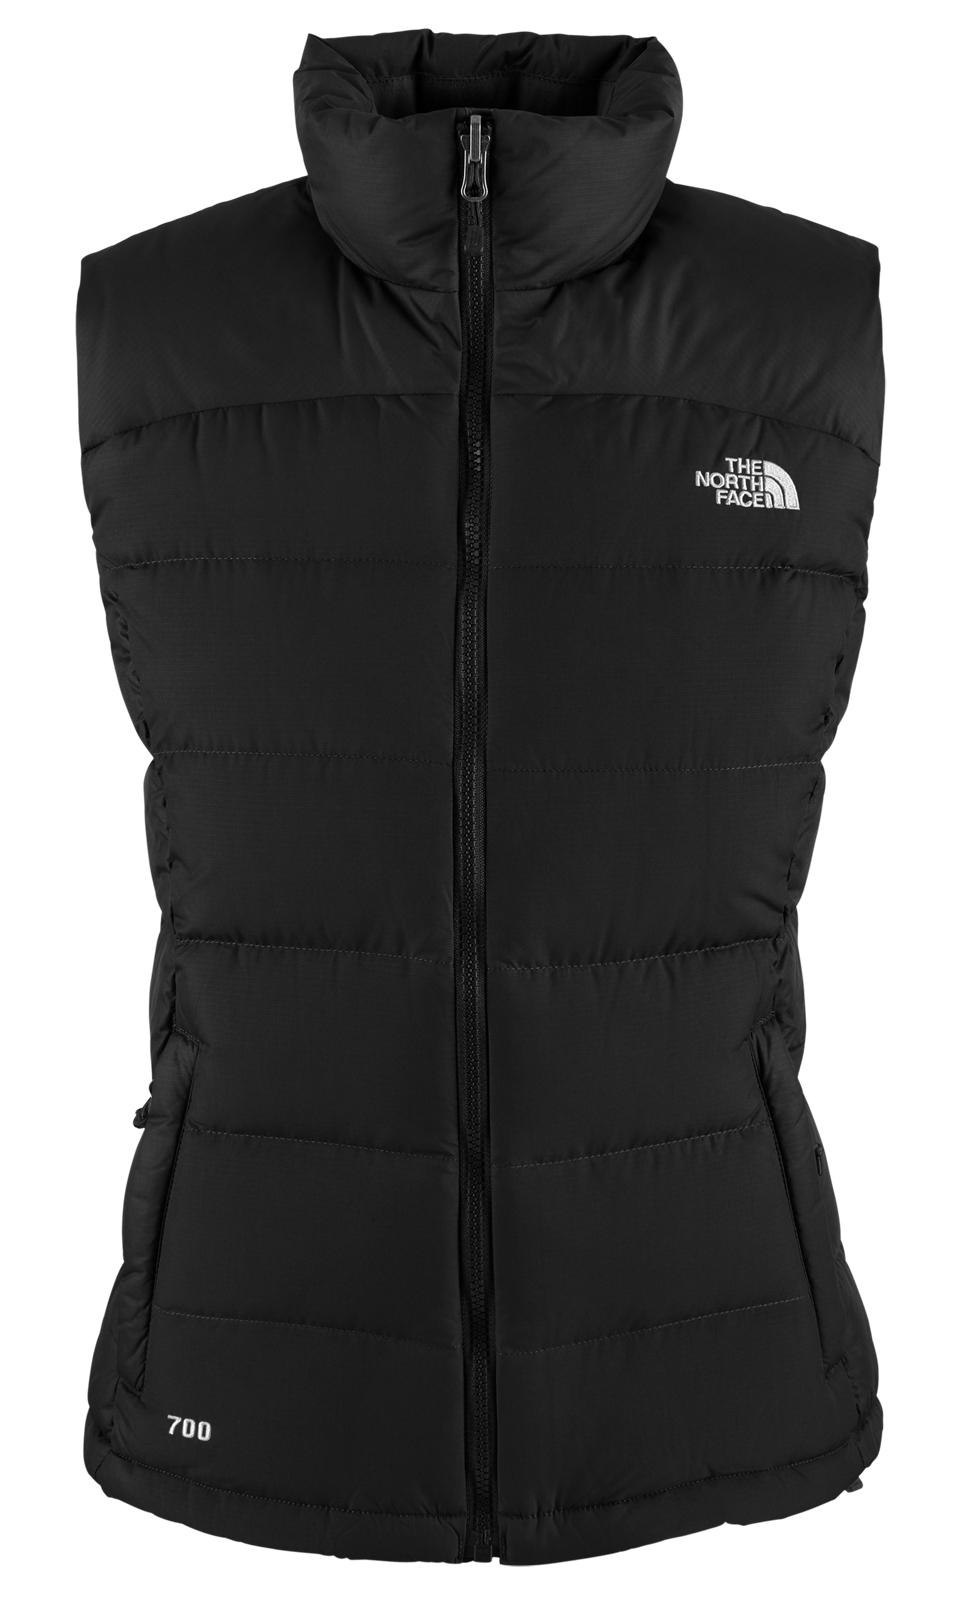 fb0b6dfd78 the-north-face-womens-nuptse-2-vest